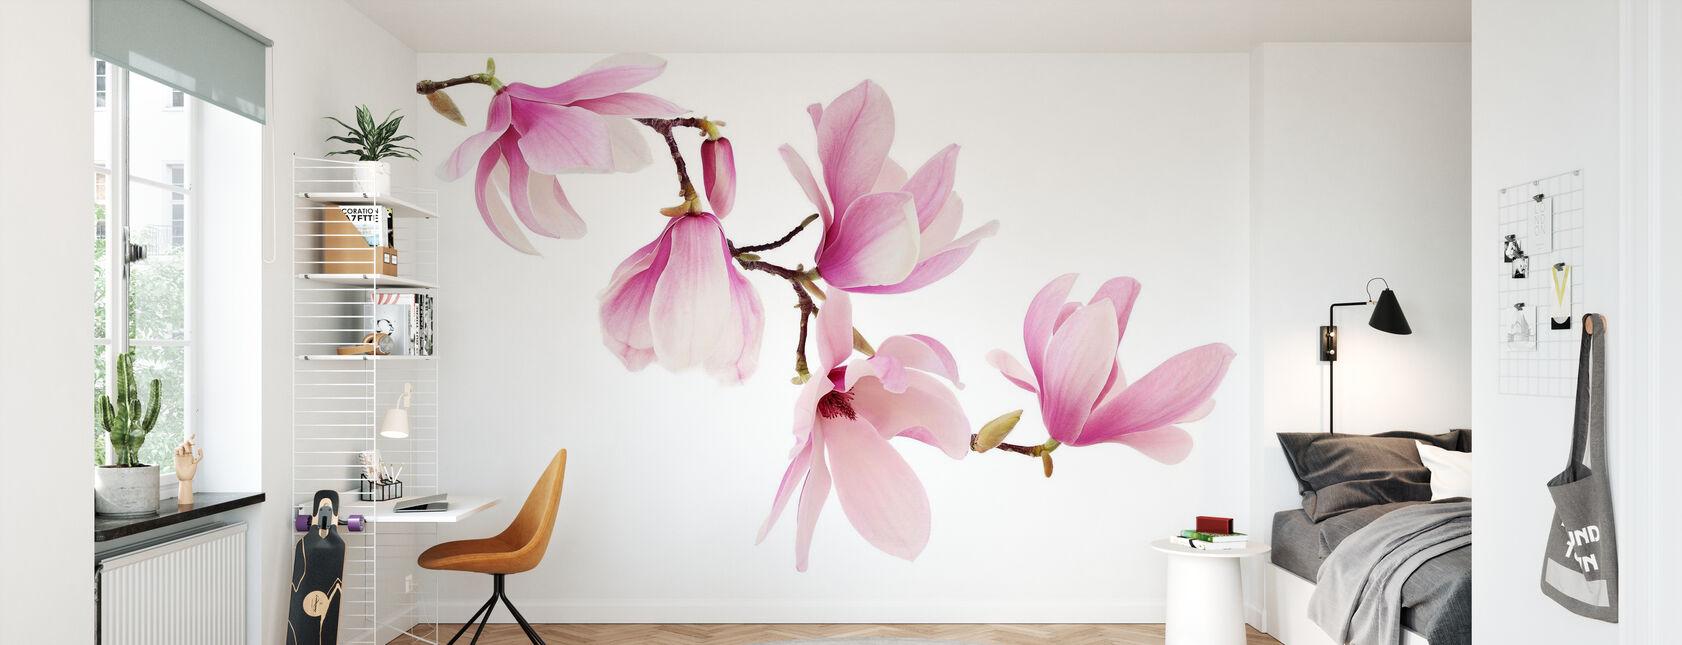 Spring Magnolia - Wallpaper - Kids Room